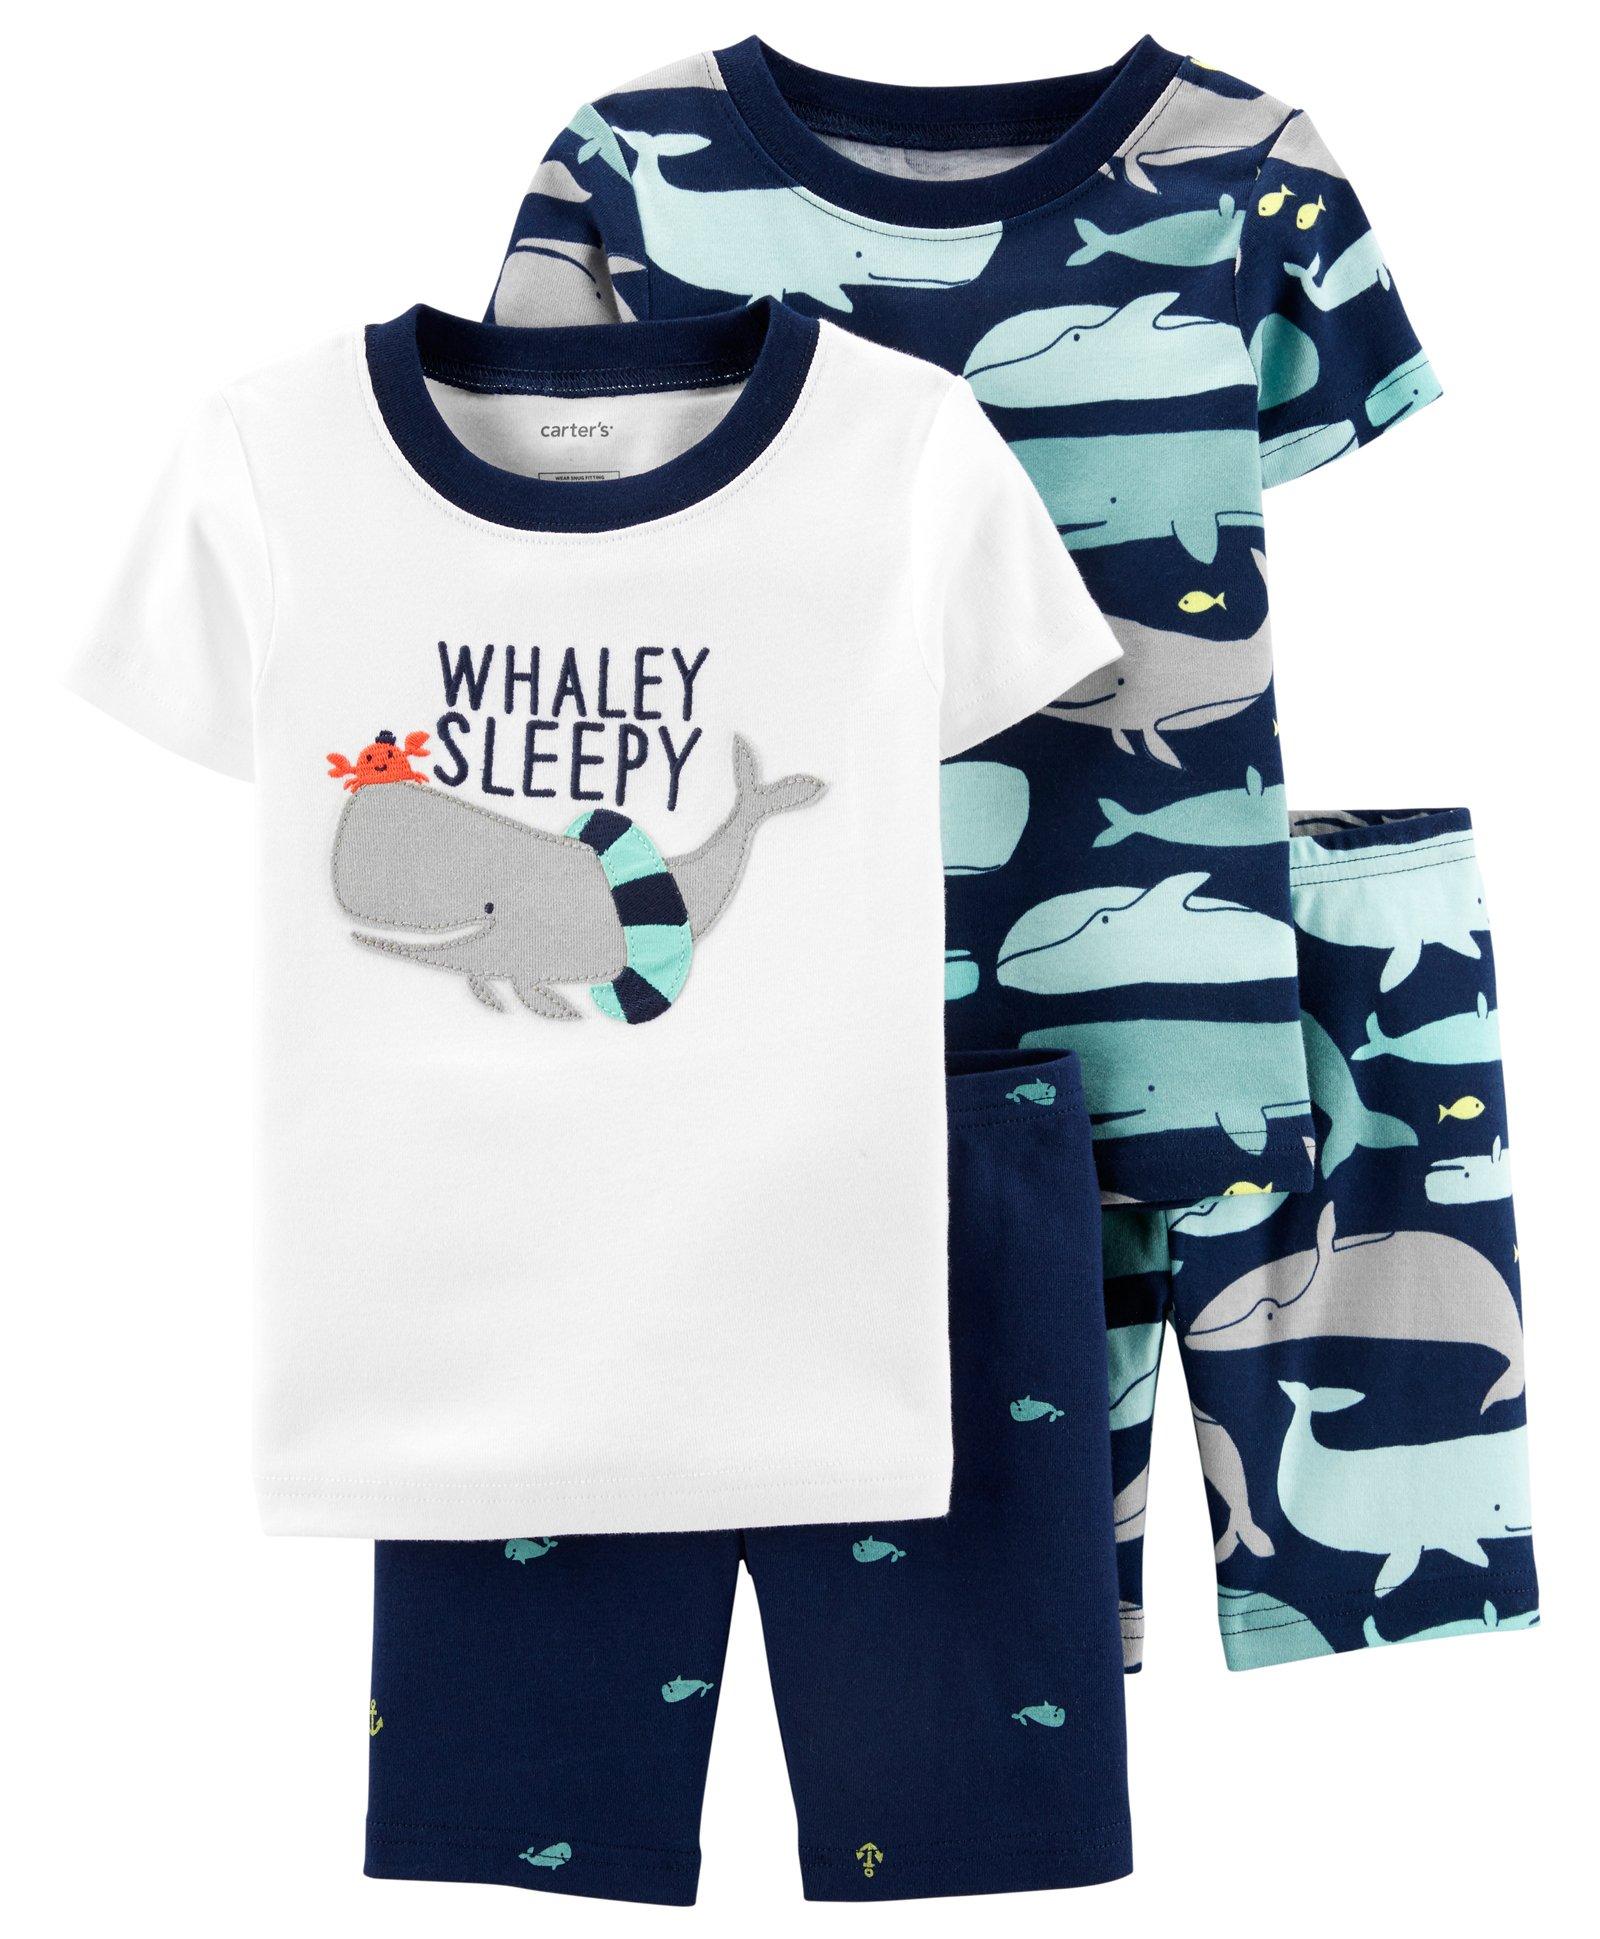 Carters 4-Pc Baby Girls Whale Printed Cotton Pajamas Set